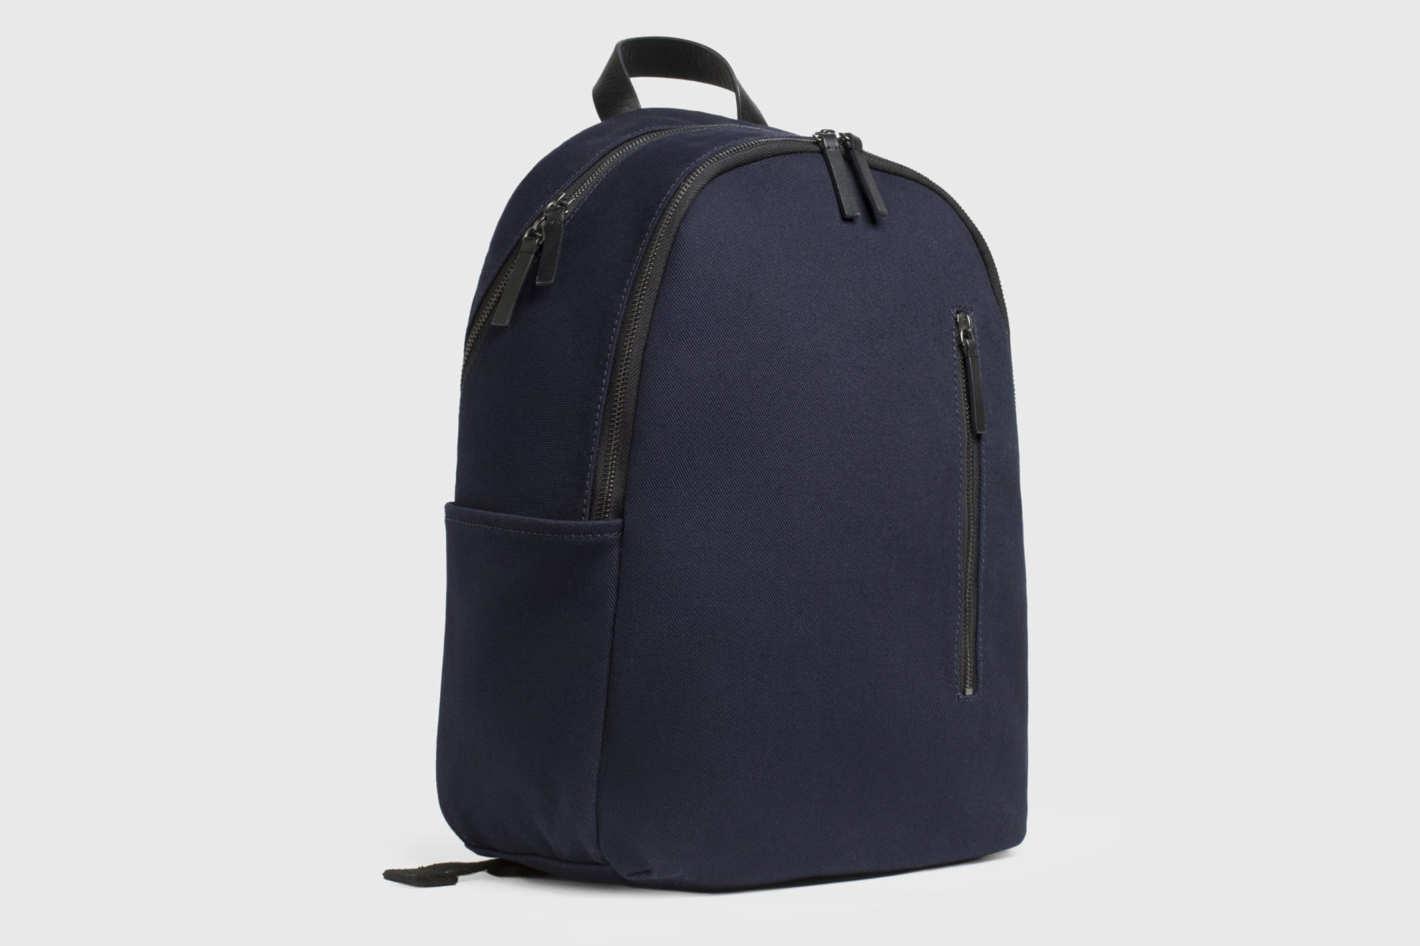 Everlane Modern Commuter Backpack